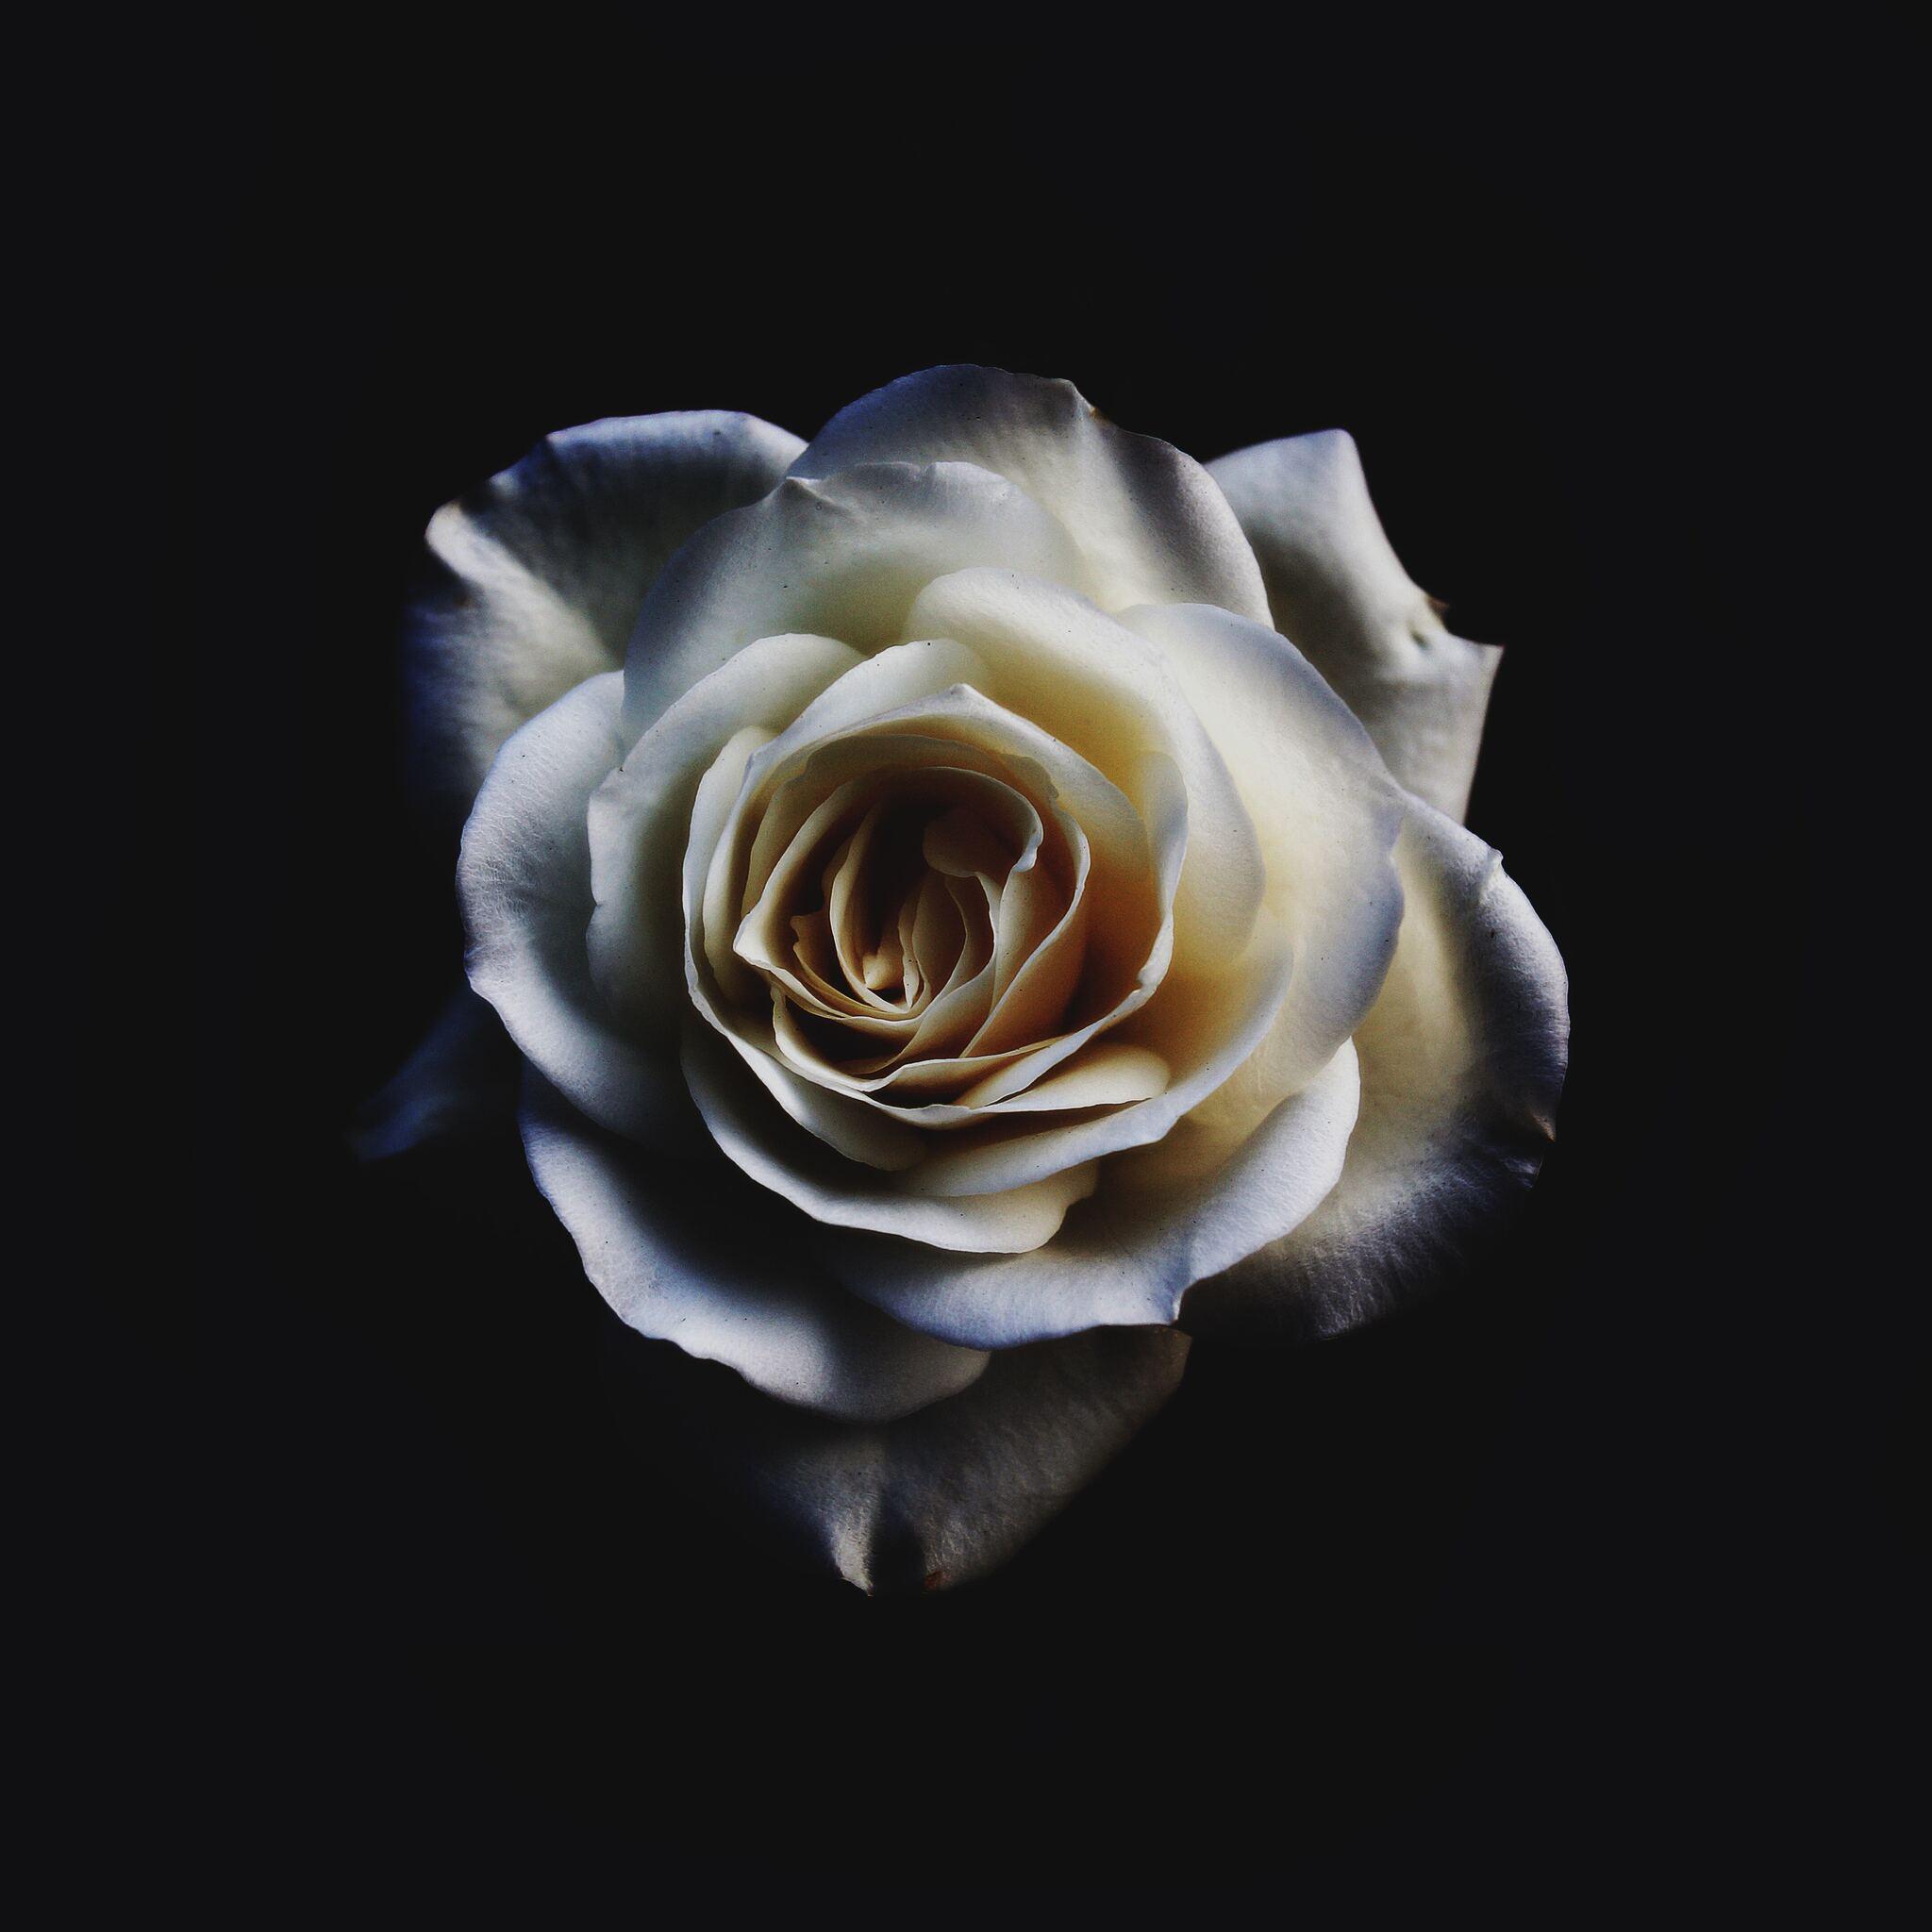 white-rose-oled-5k-u5.jpg